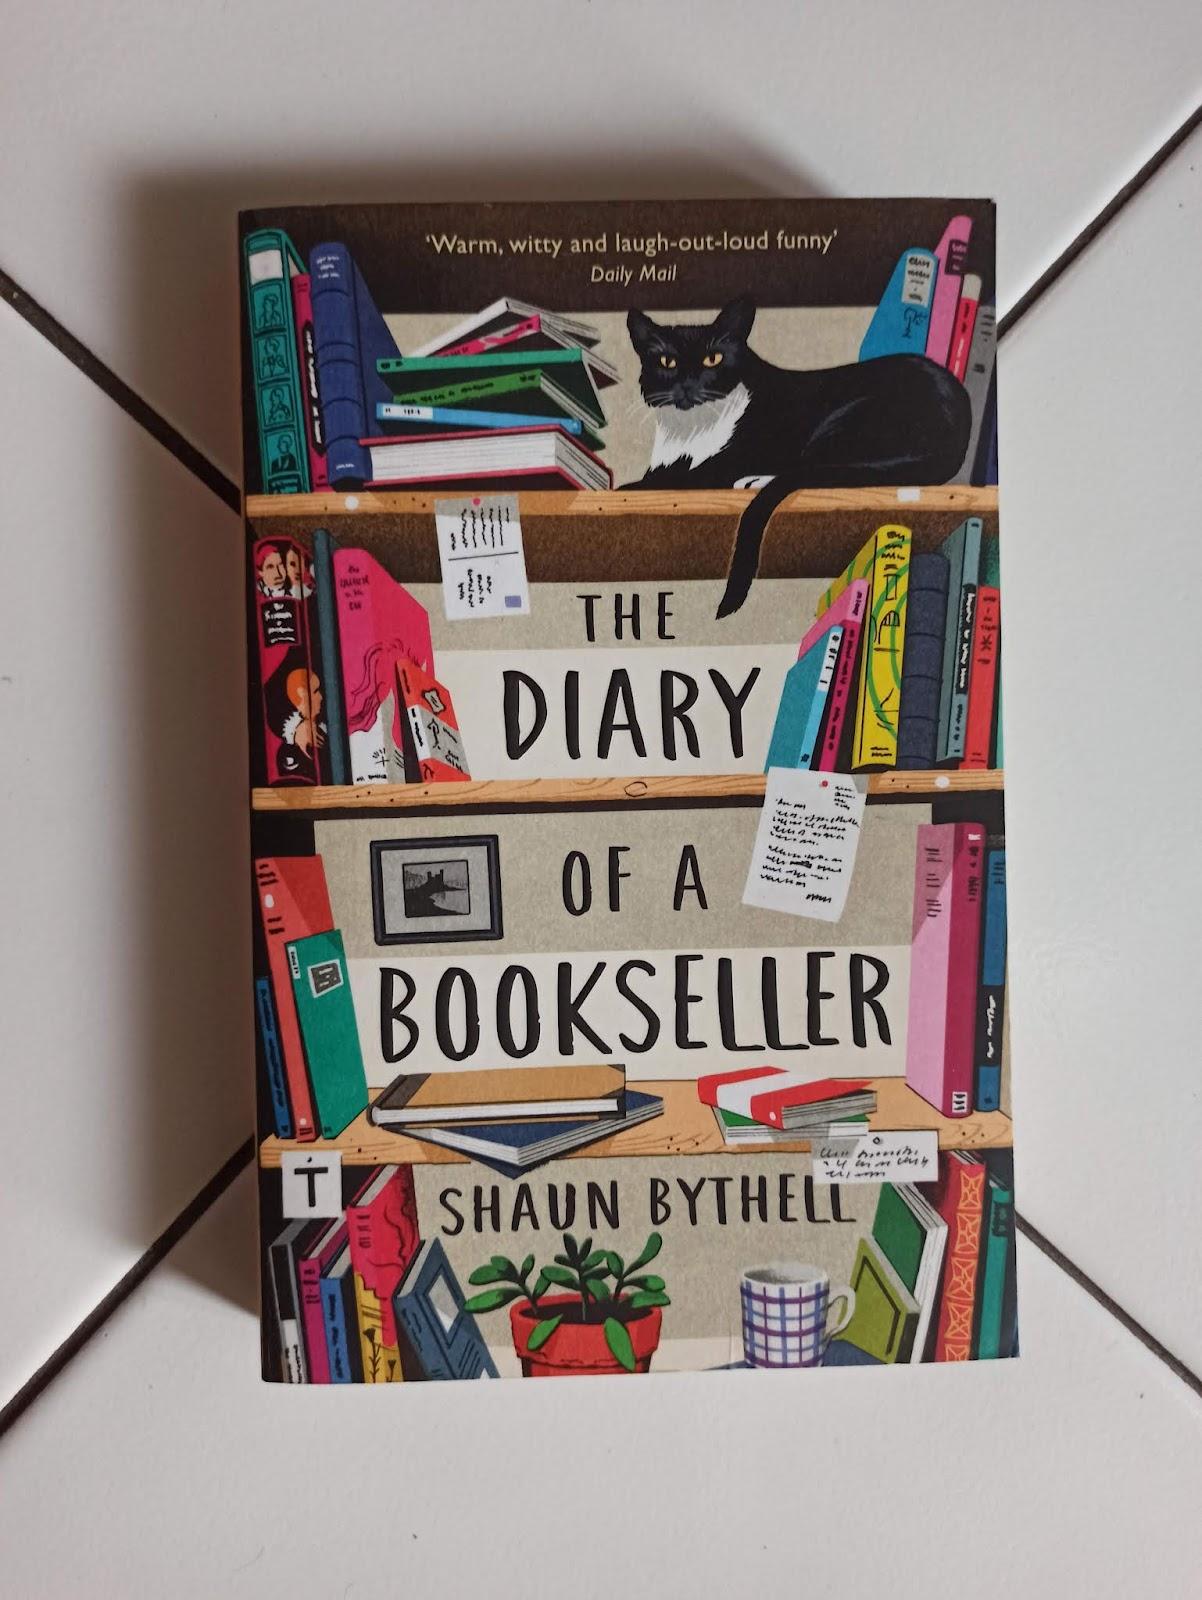 Biography of Shaun Bythell